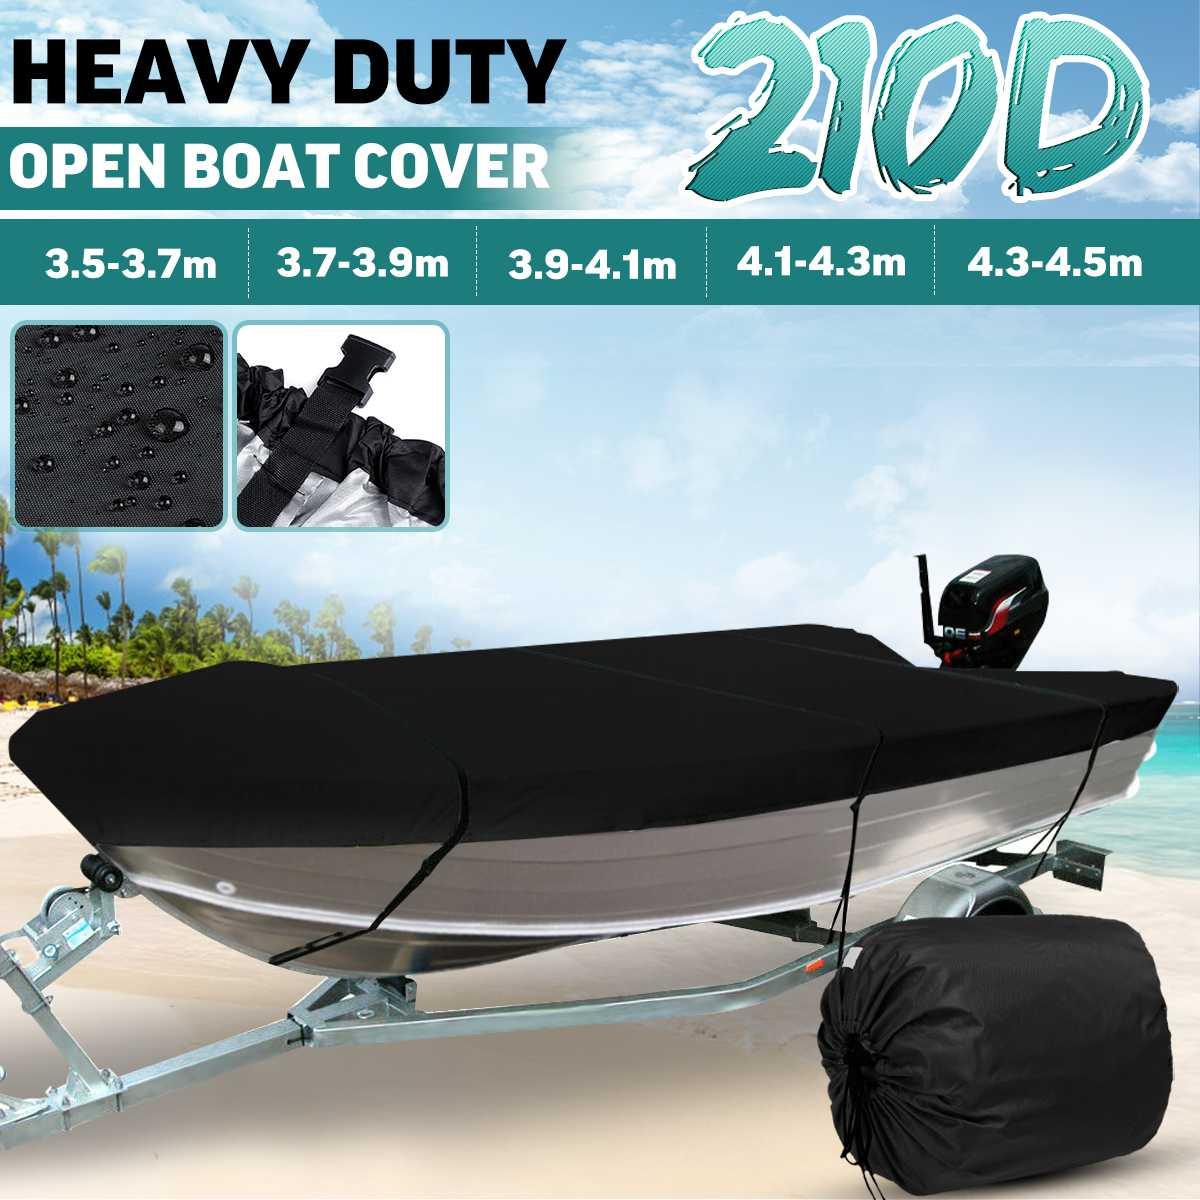 3.5-4.5m Black Trailerable Heavy Duty Open Boat Cover Fishing Ski Runabout Waterproof 210D Sunproof Anti UV V-Hull Boat Cover